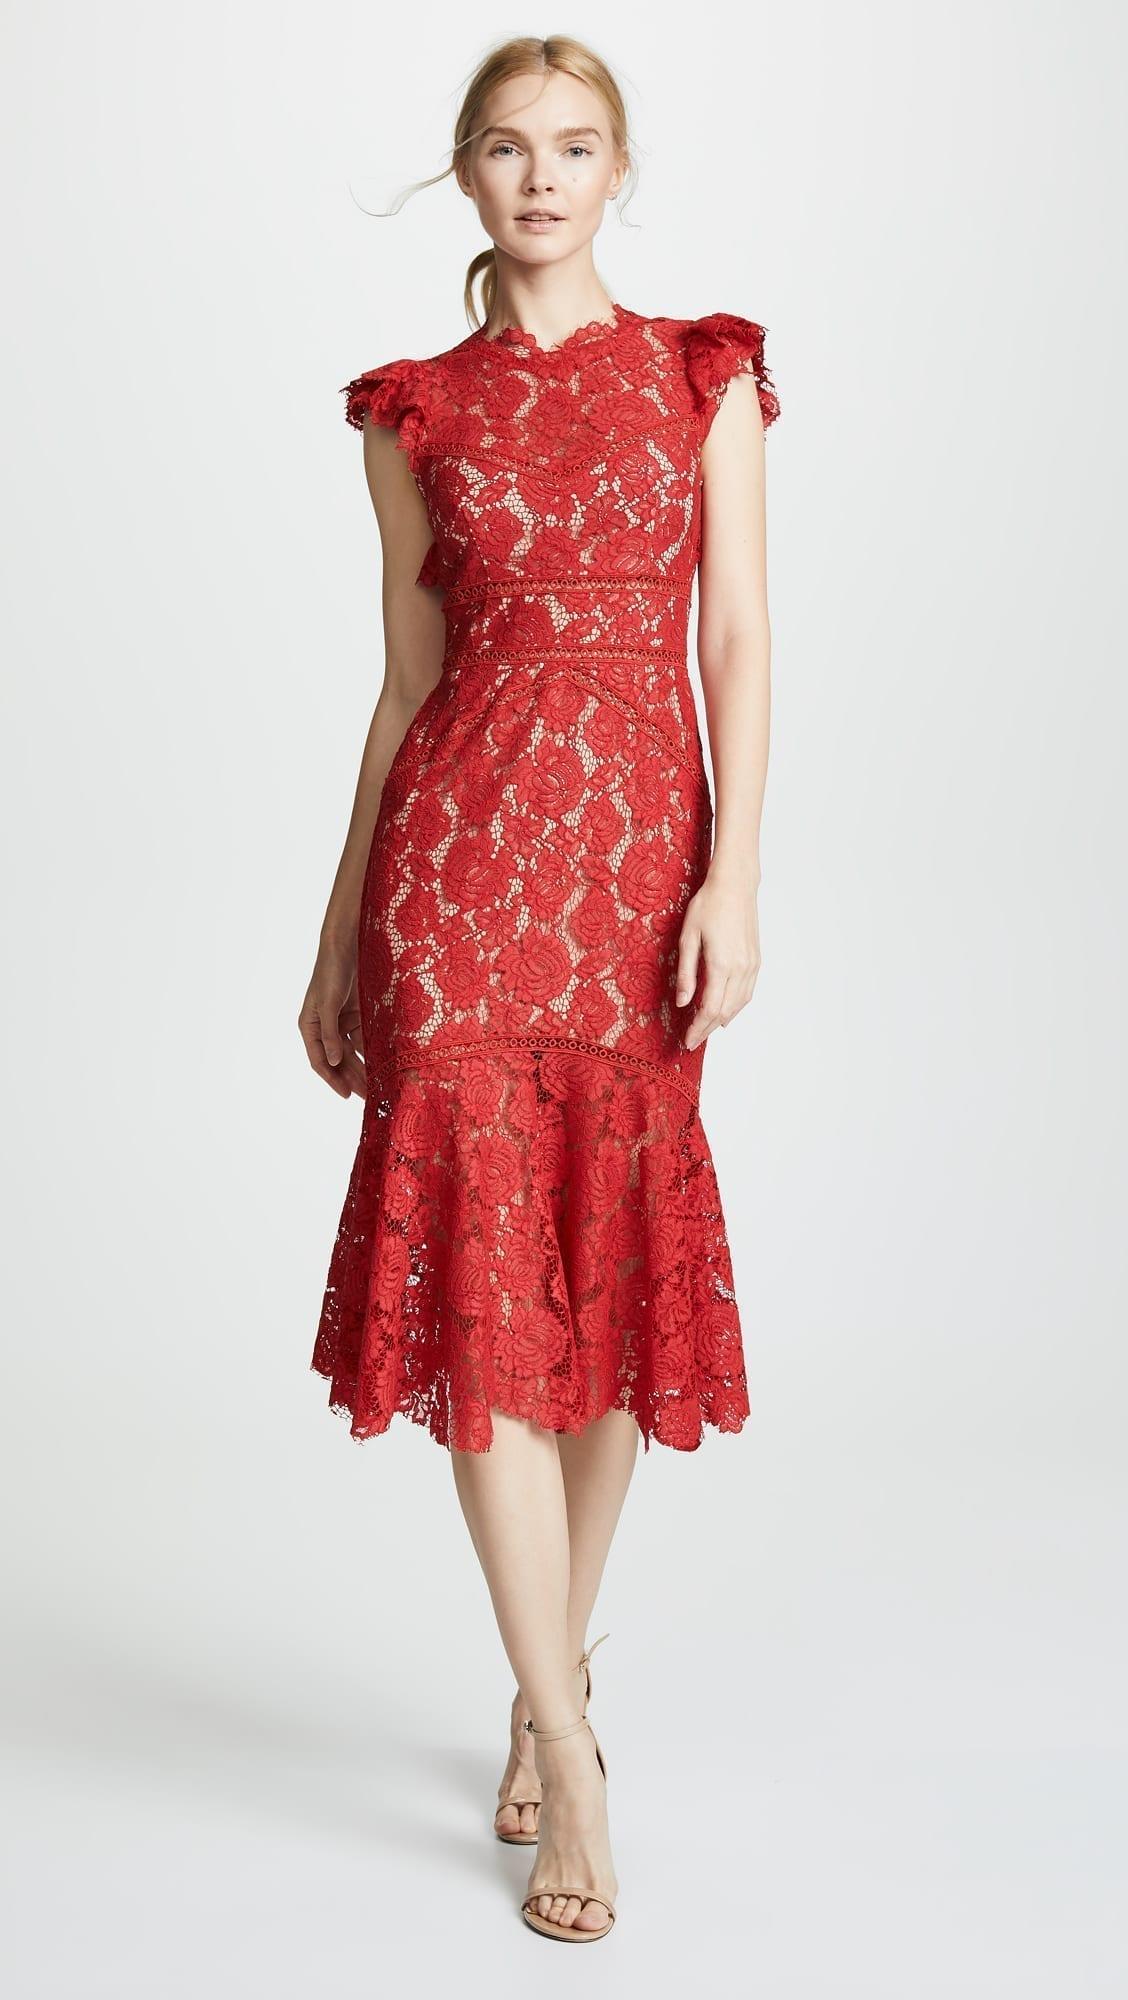 SAYLOR Maude Red Dress